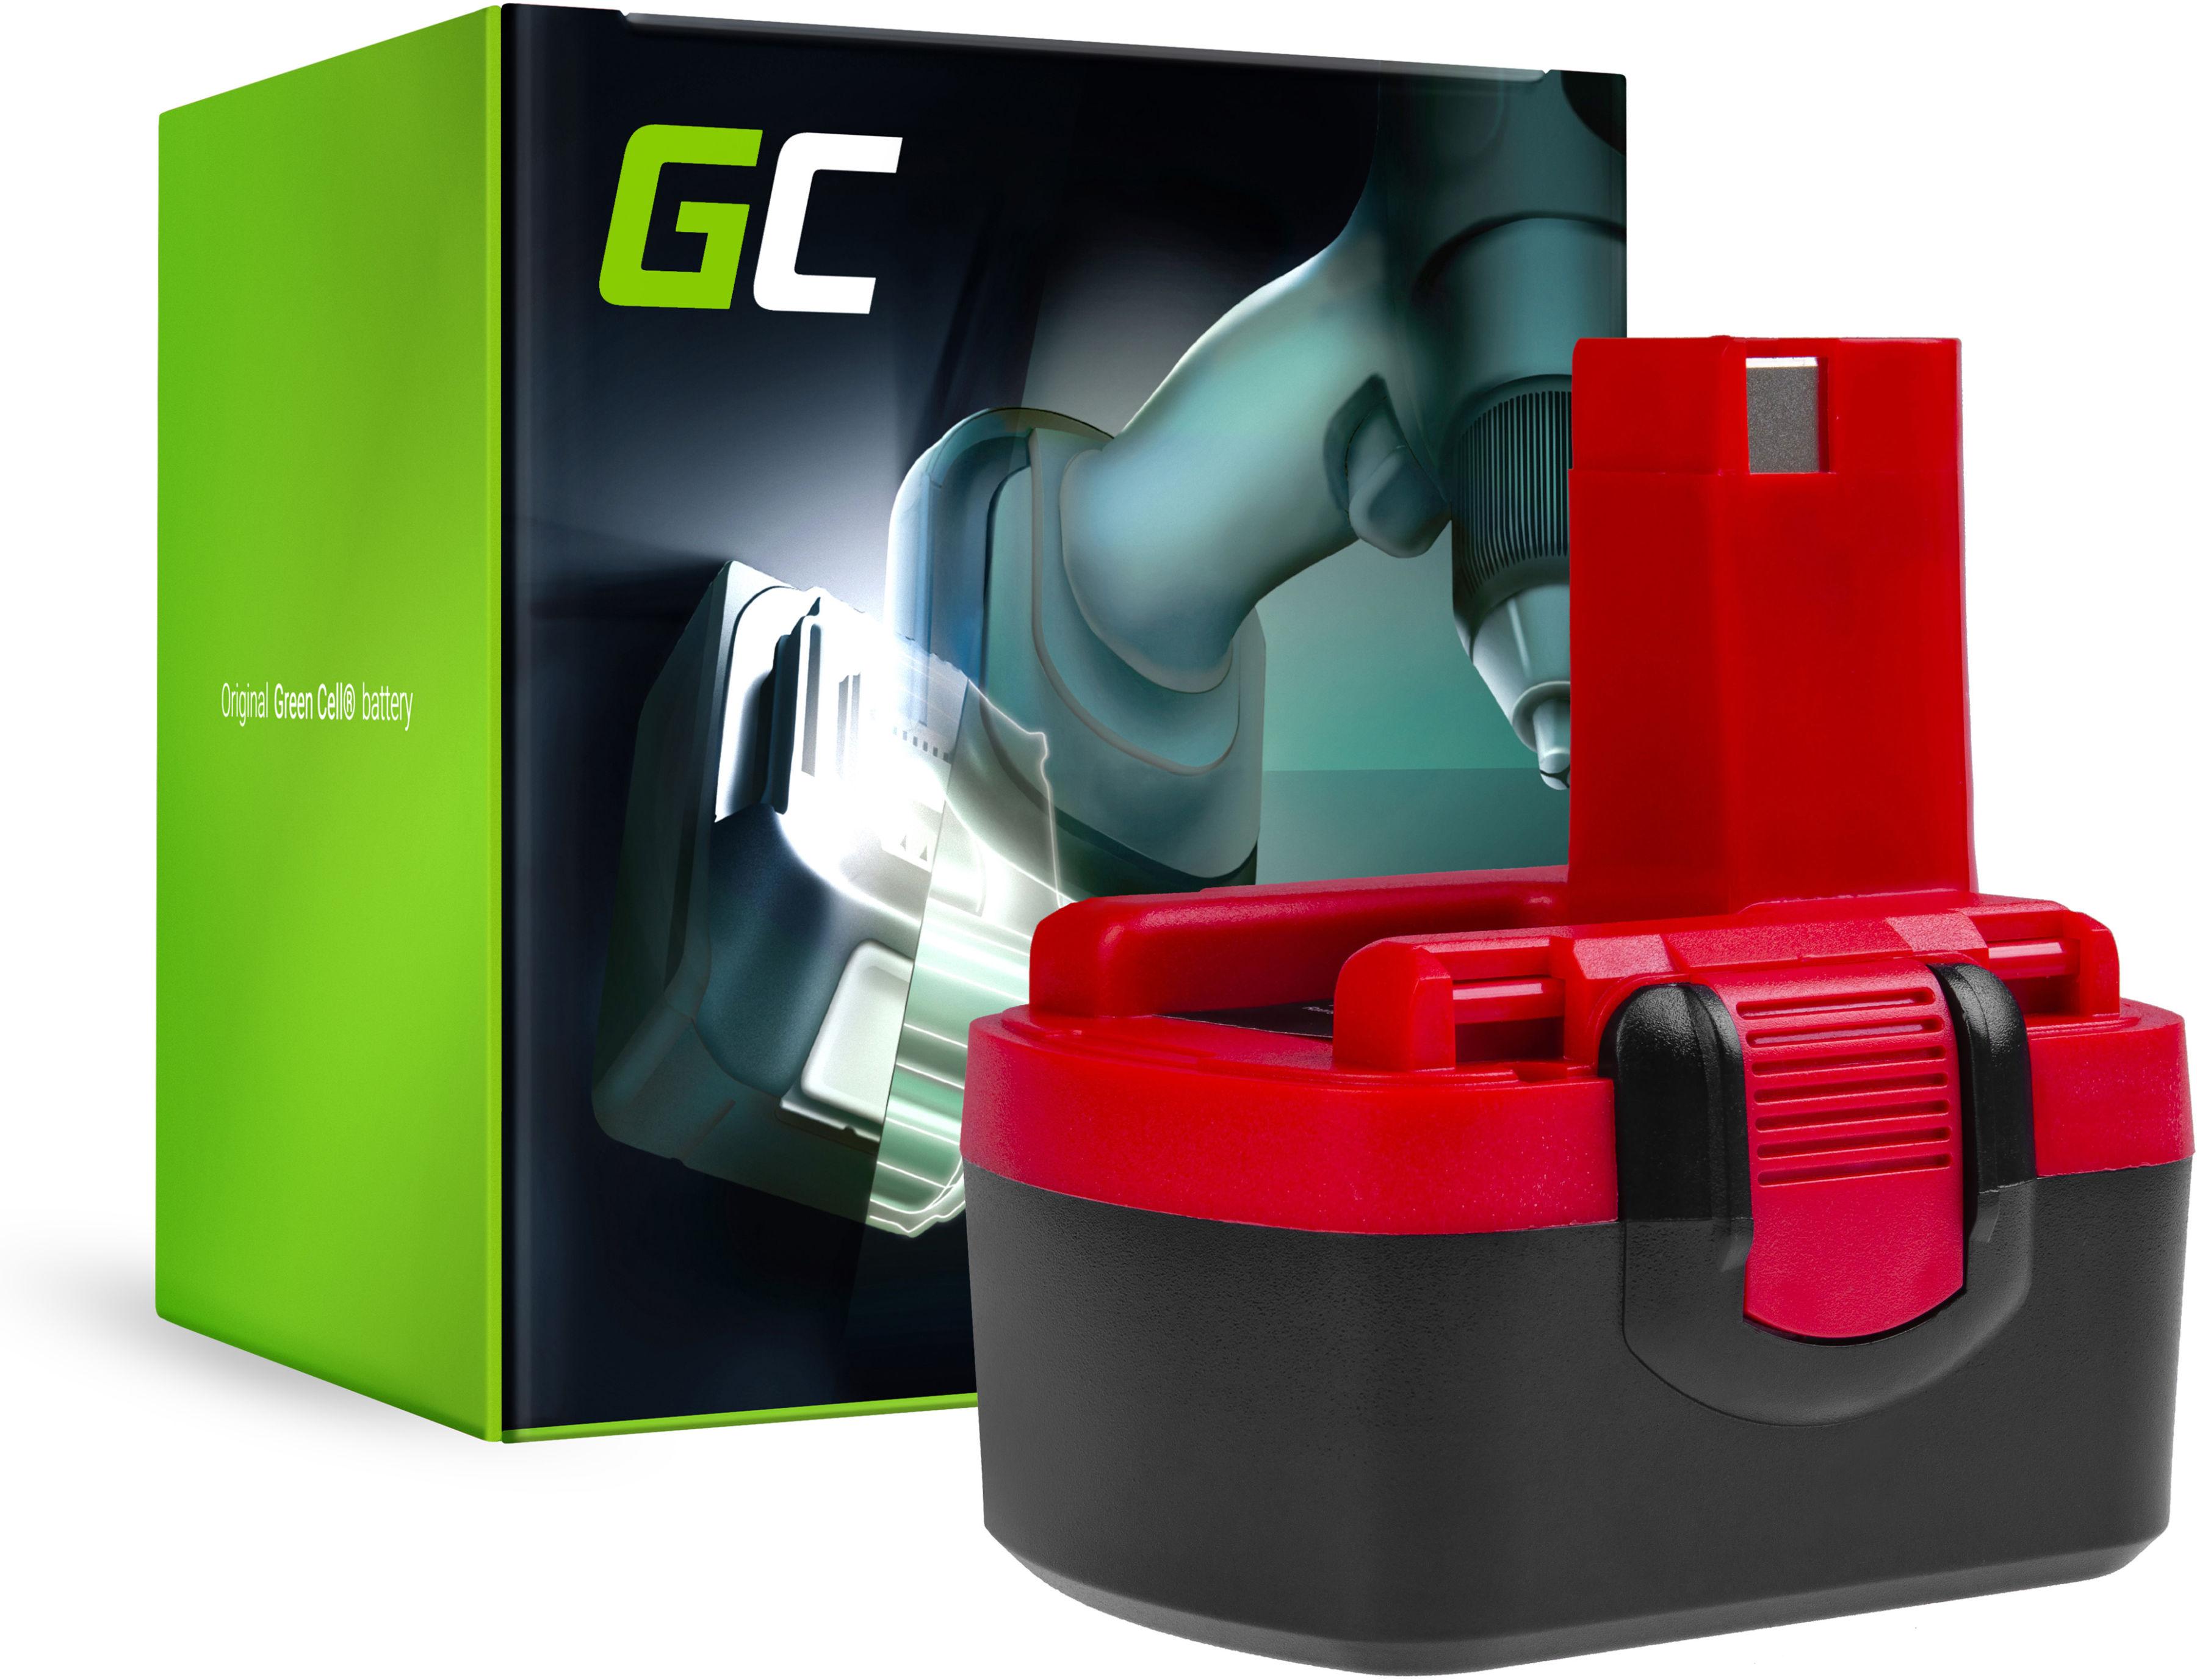 Bateria Green Cell (3Ah 14.4V) 2 607 335 619 2607335711 2607335263 BAT038 do Bosch O-PACK GSR PSR PSB 14,4 14,4-2 VE-2 VES-2